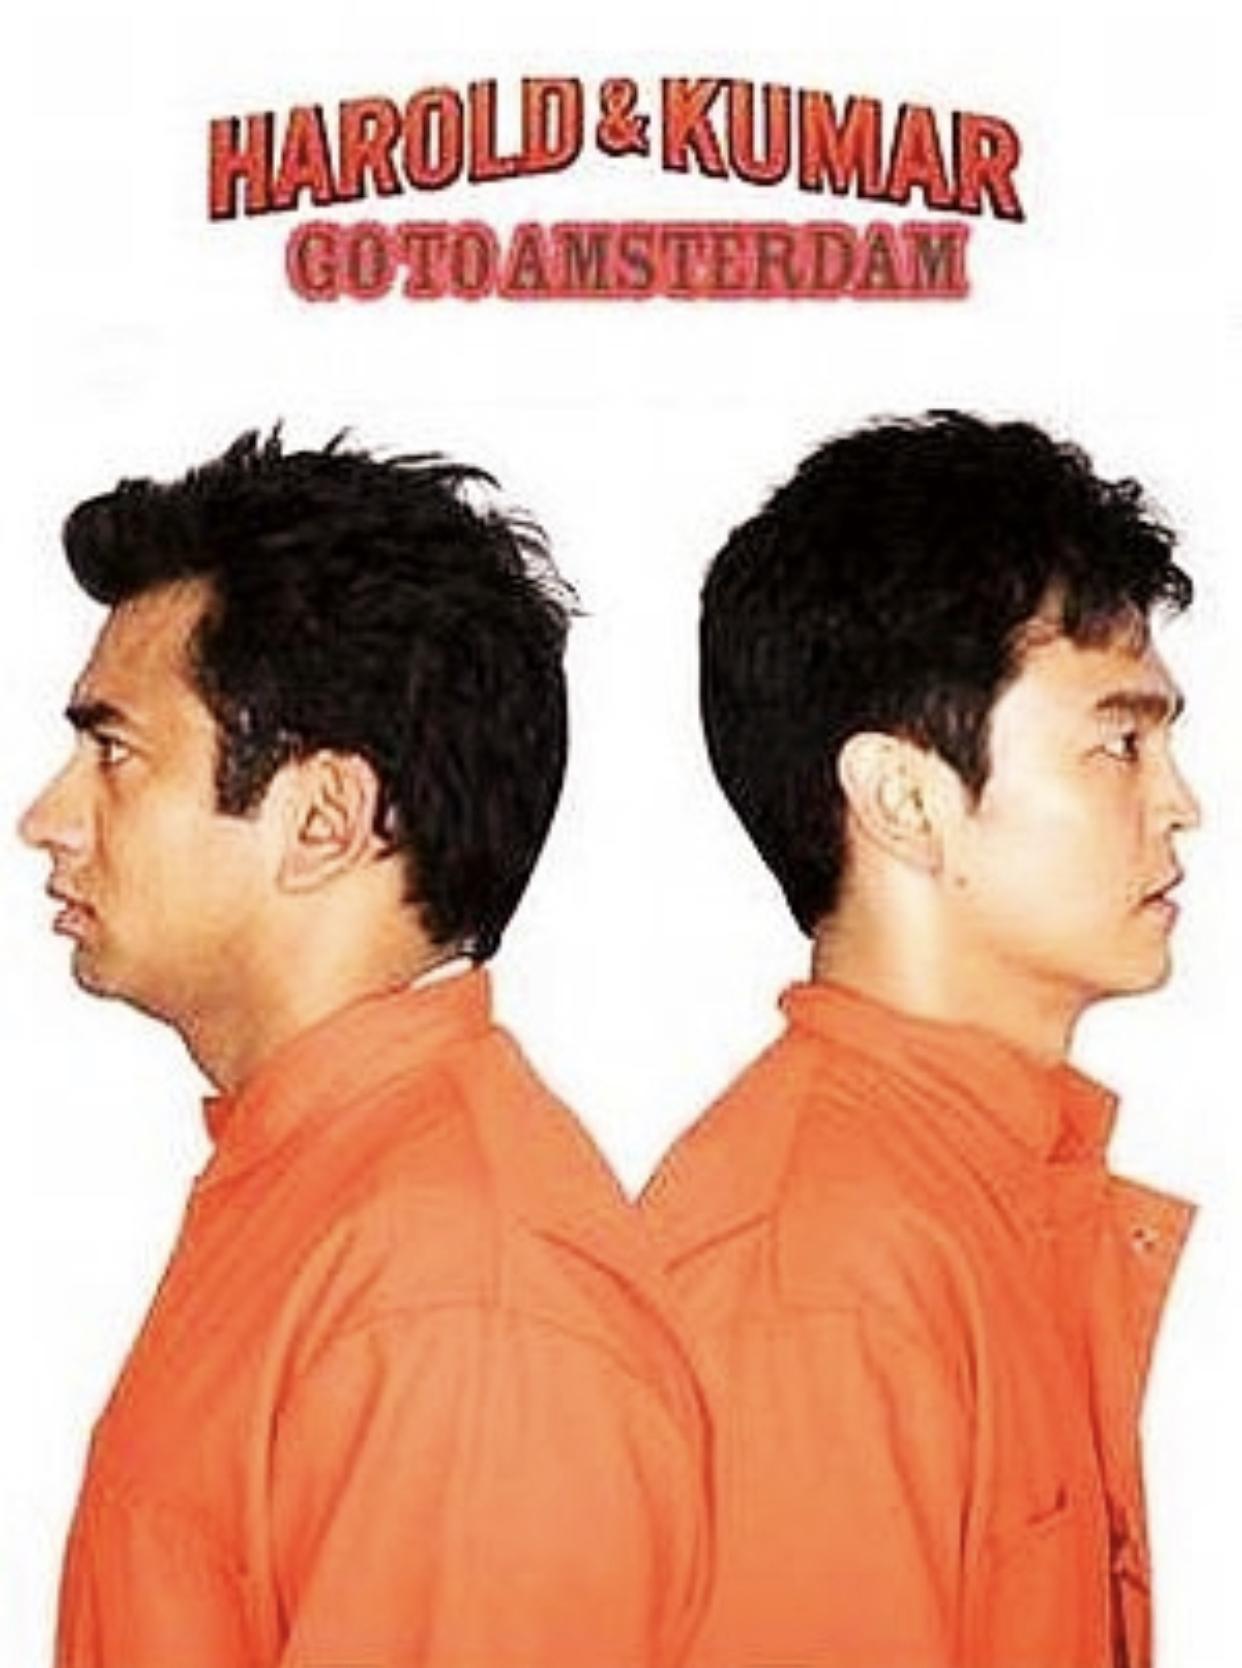 Harold Kumar Go To Amsterdam Video 2008 Imdb